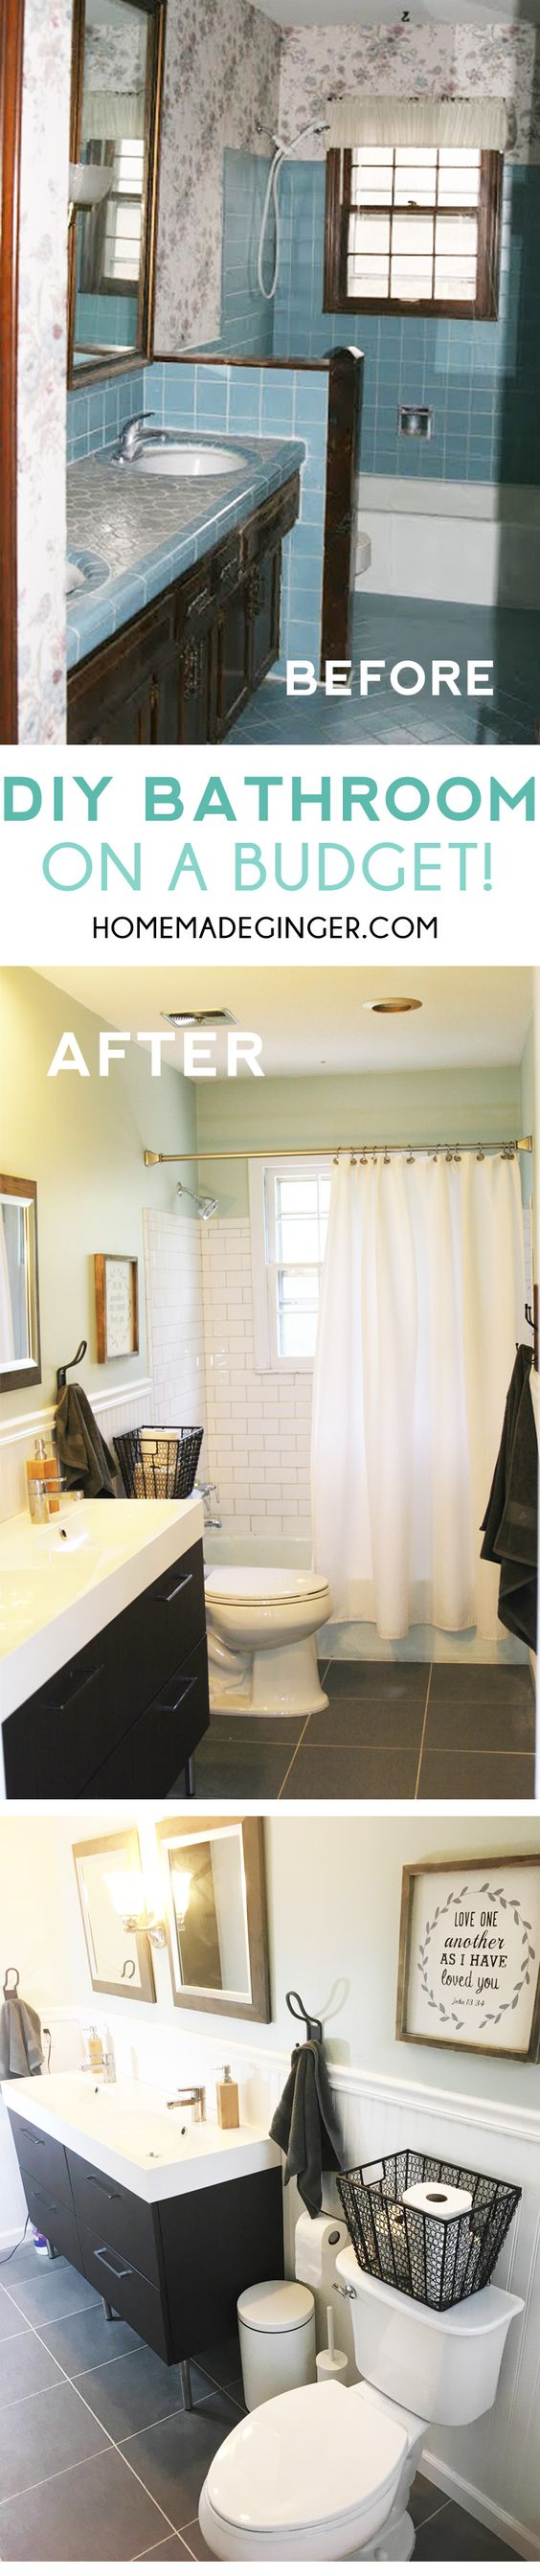 Diy Bathroom On A Budget Home Renovation Photos And Money